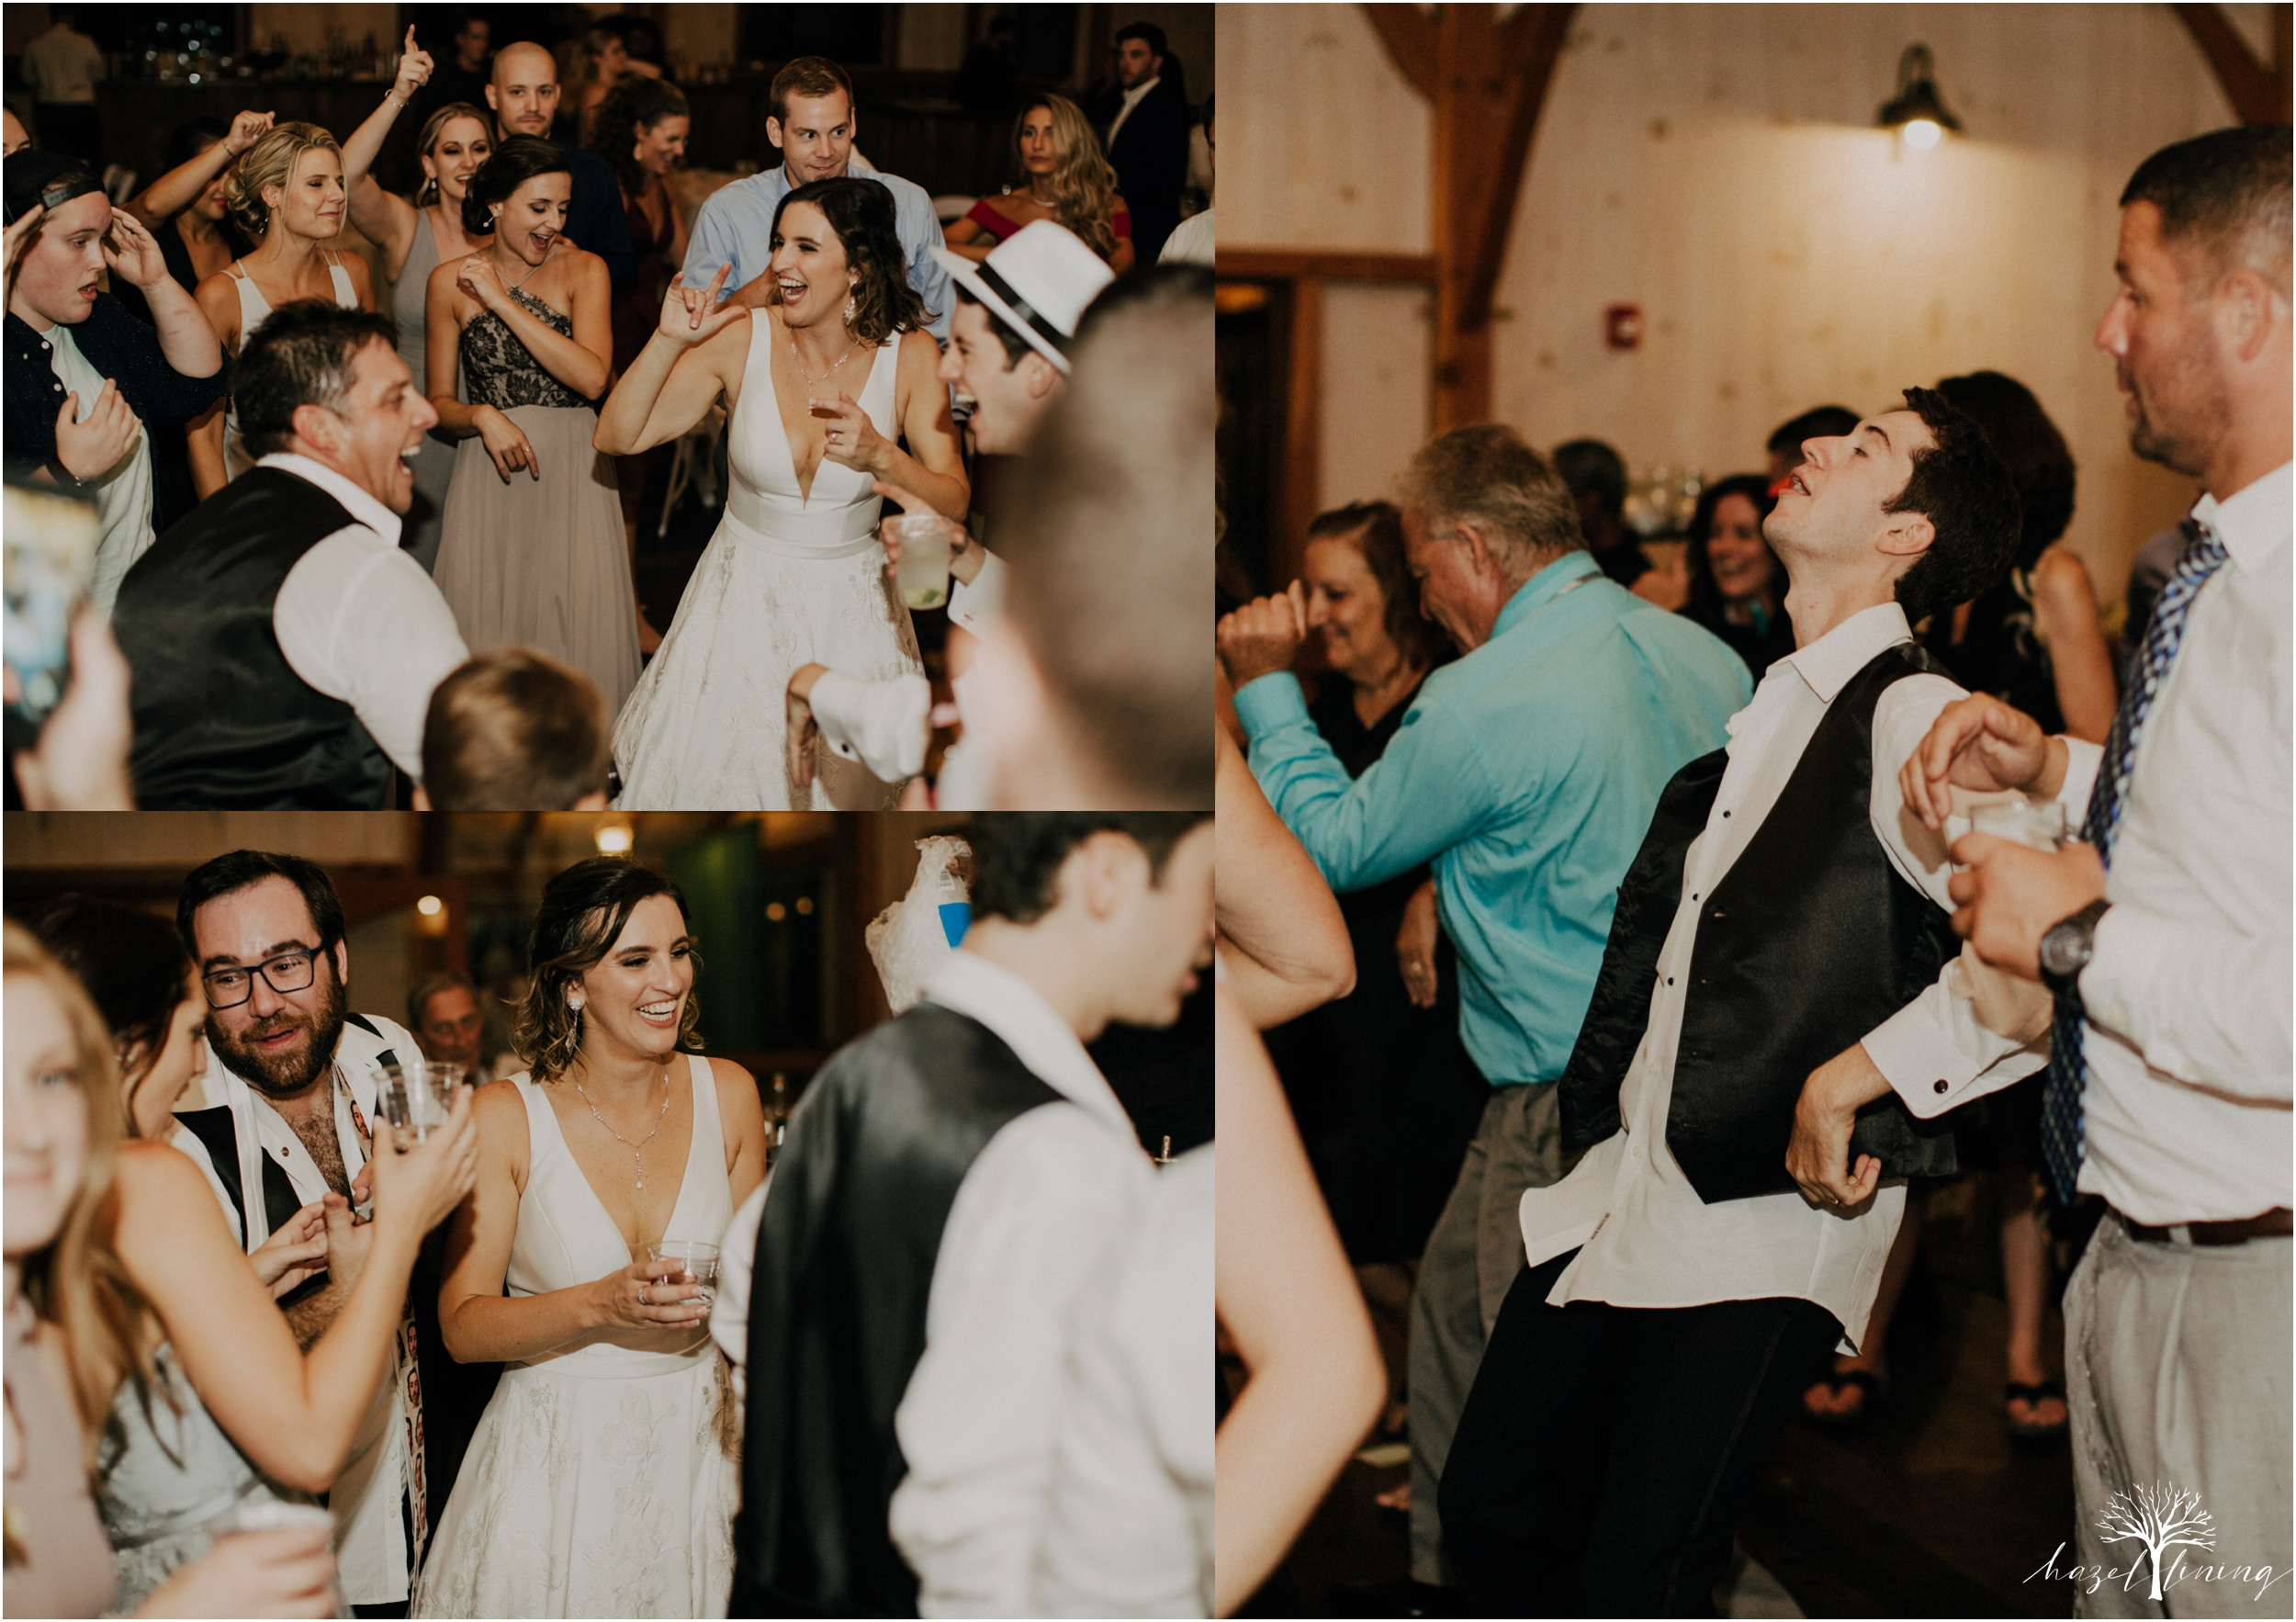 maureen-hepner-anthony-giordano-rose-bank-winery-newtow-pennsylvania-luxury-summer-wedding-hazel-lining-photography-destination-elopement-wedding-engagement-photography_0156.jpg